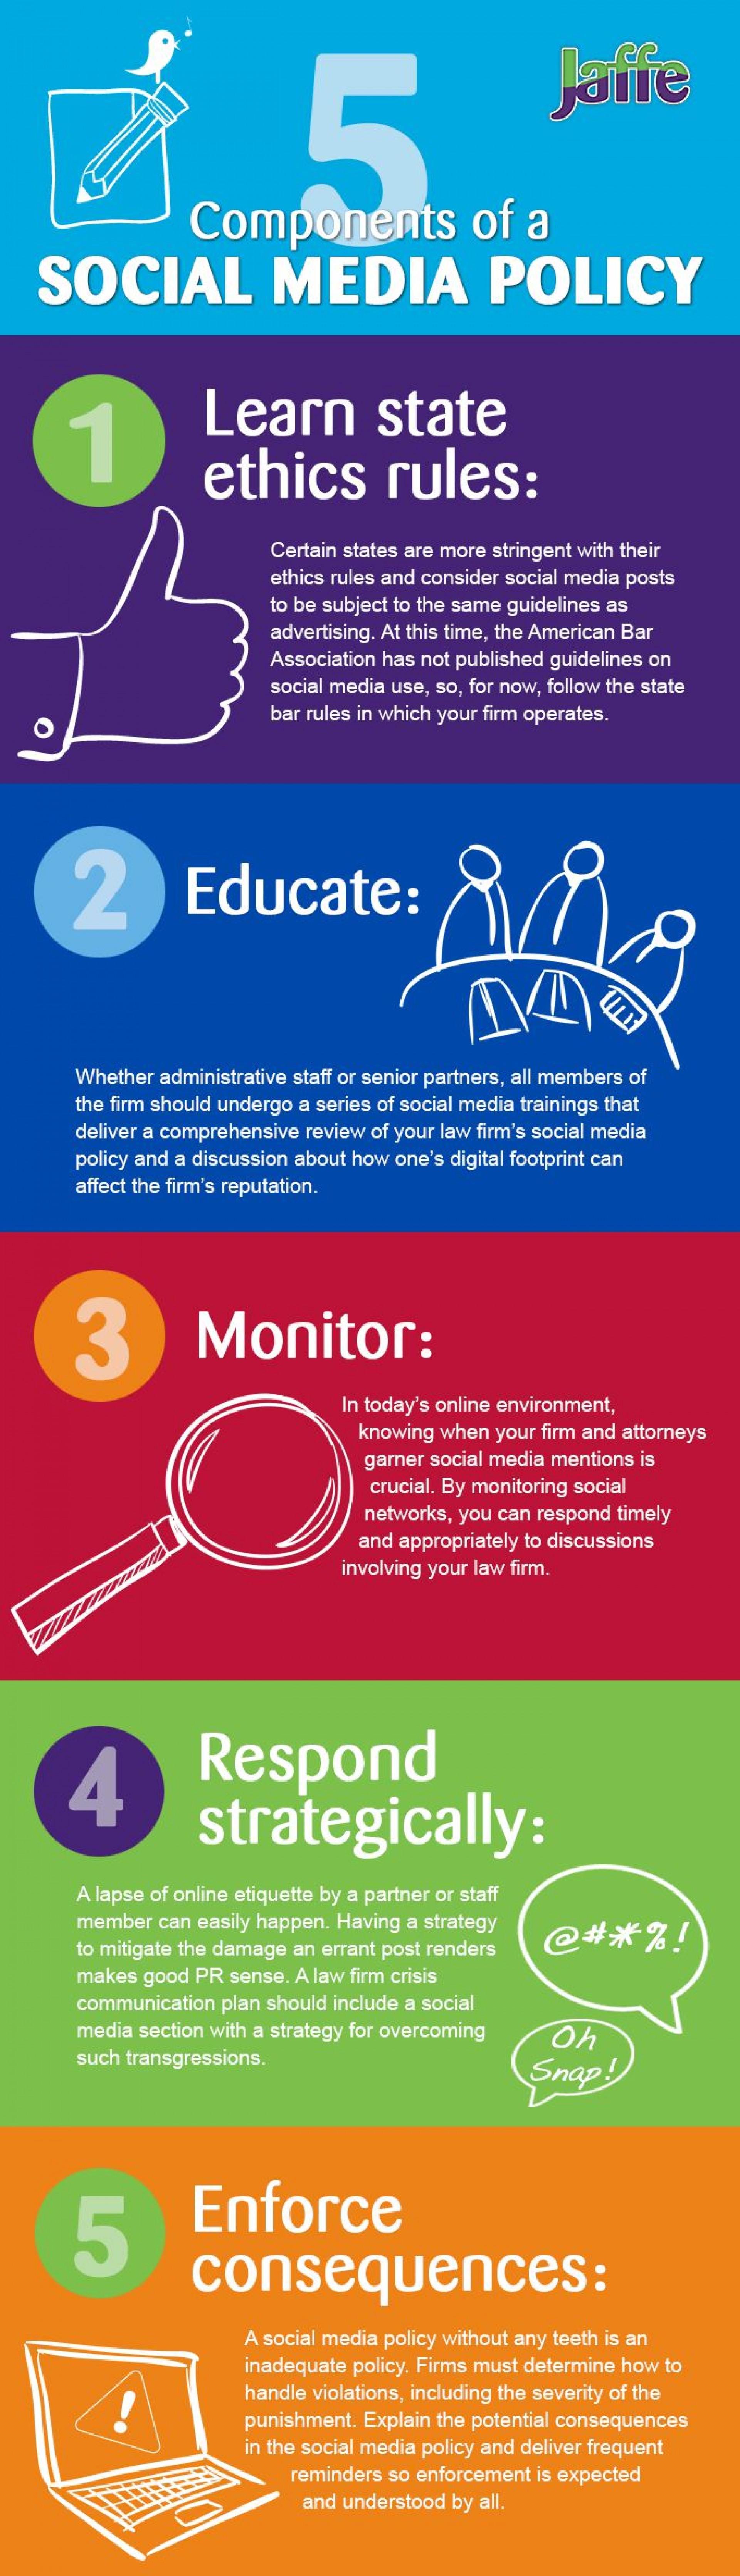 004 Top Social Media Policy Template Sample  Example Nz Australia Free Uk1920